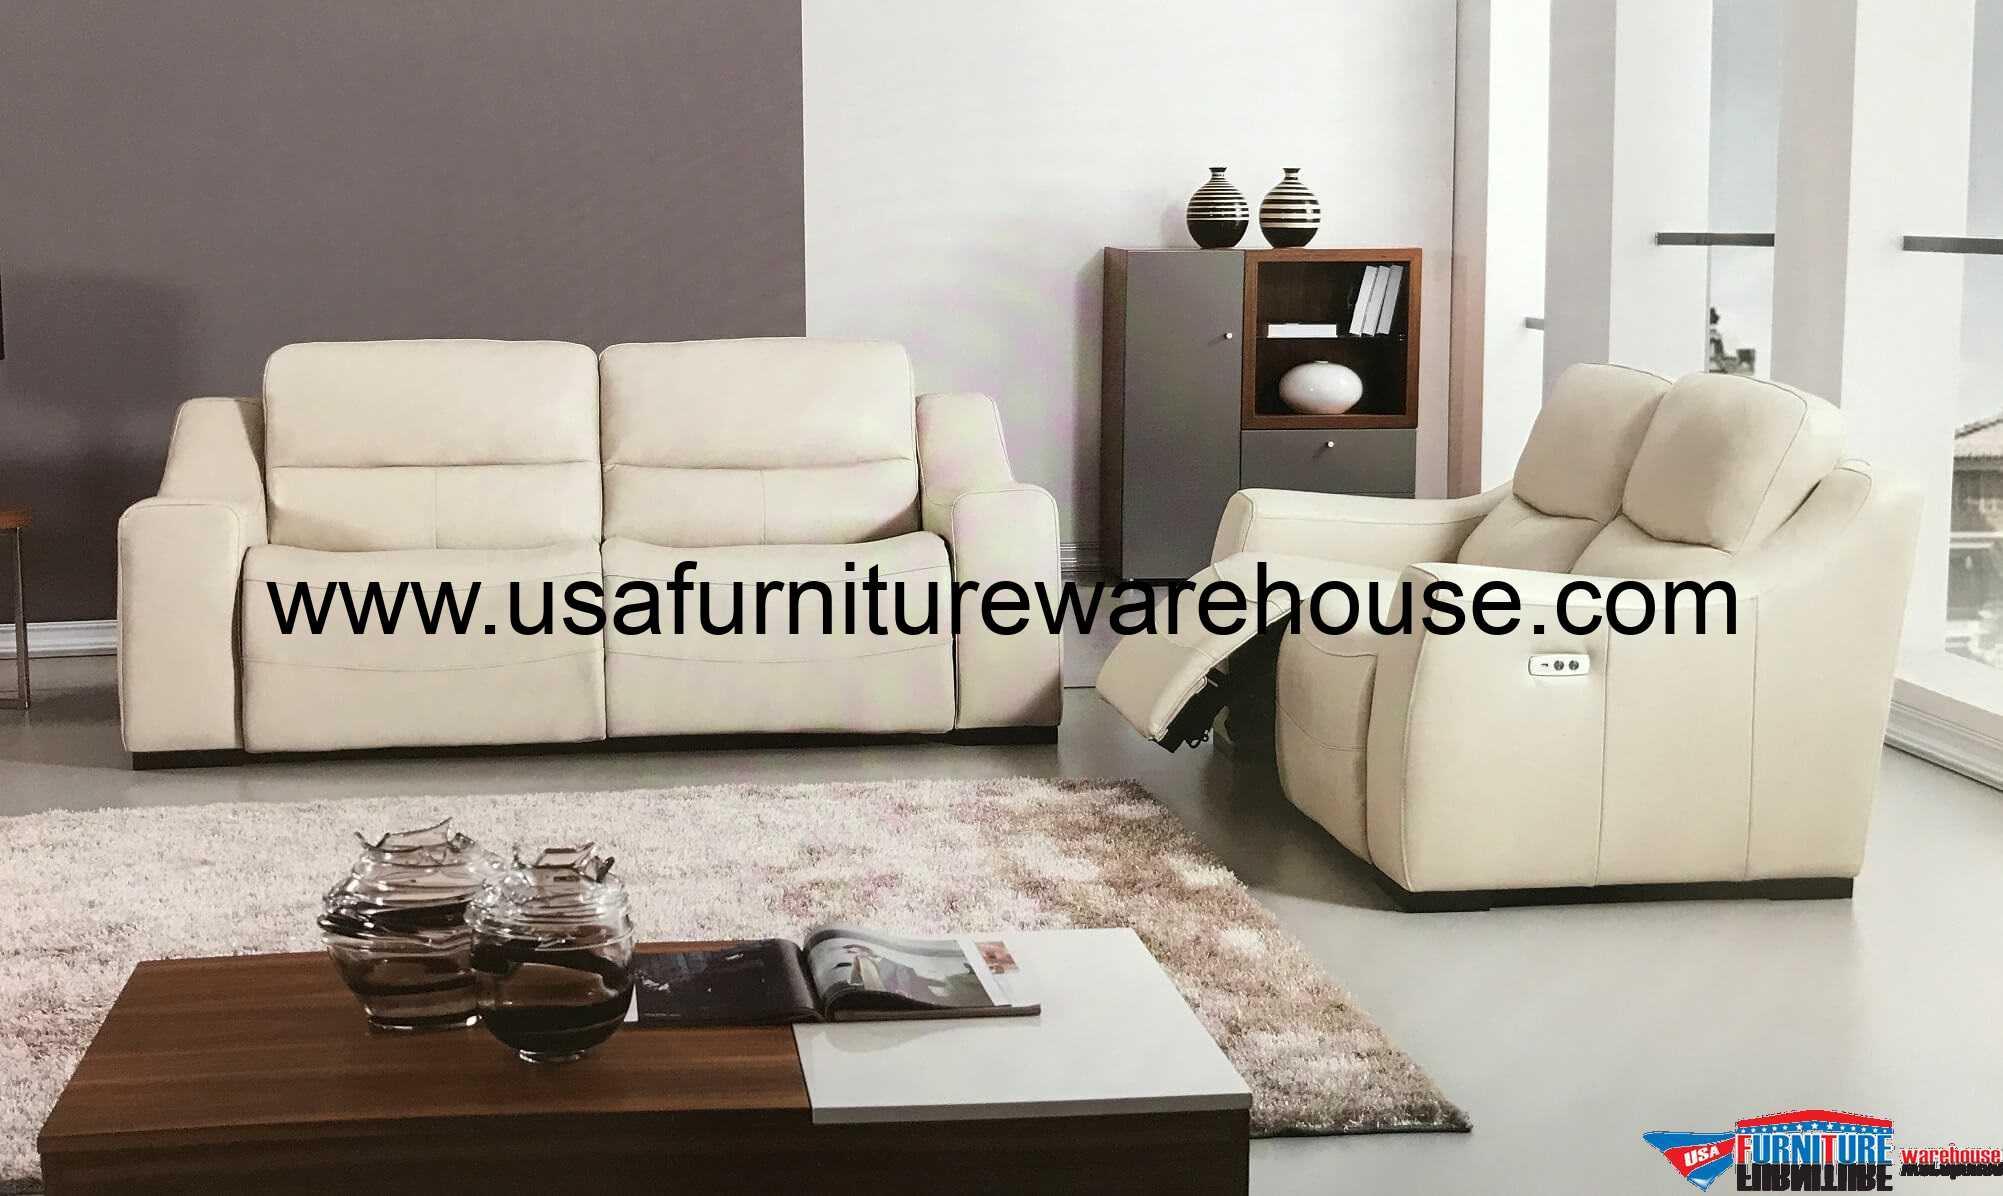 2 Piece Avana Full Italian Leather Power Recliner Sofa Set - USA ...